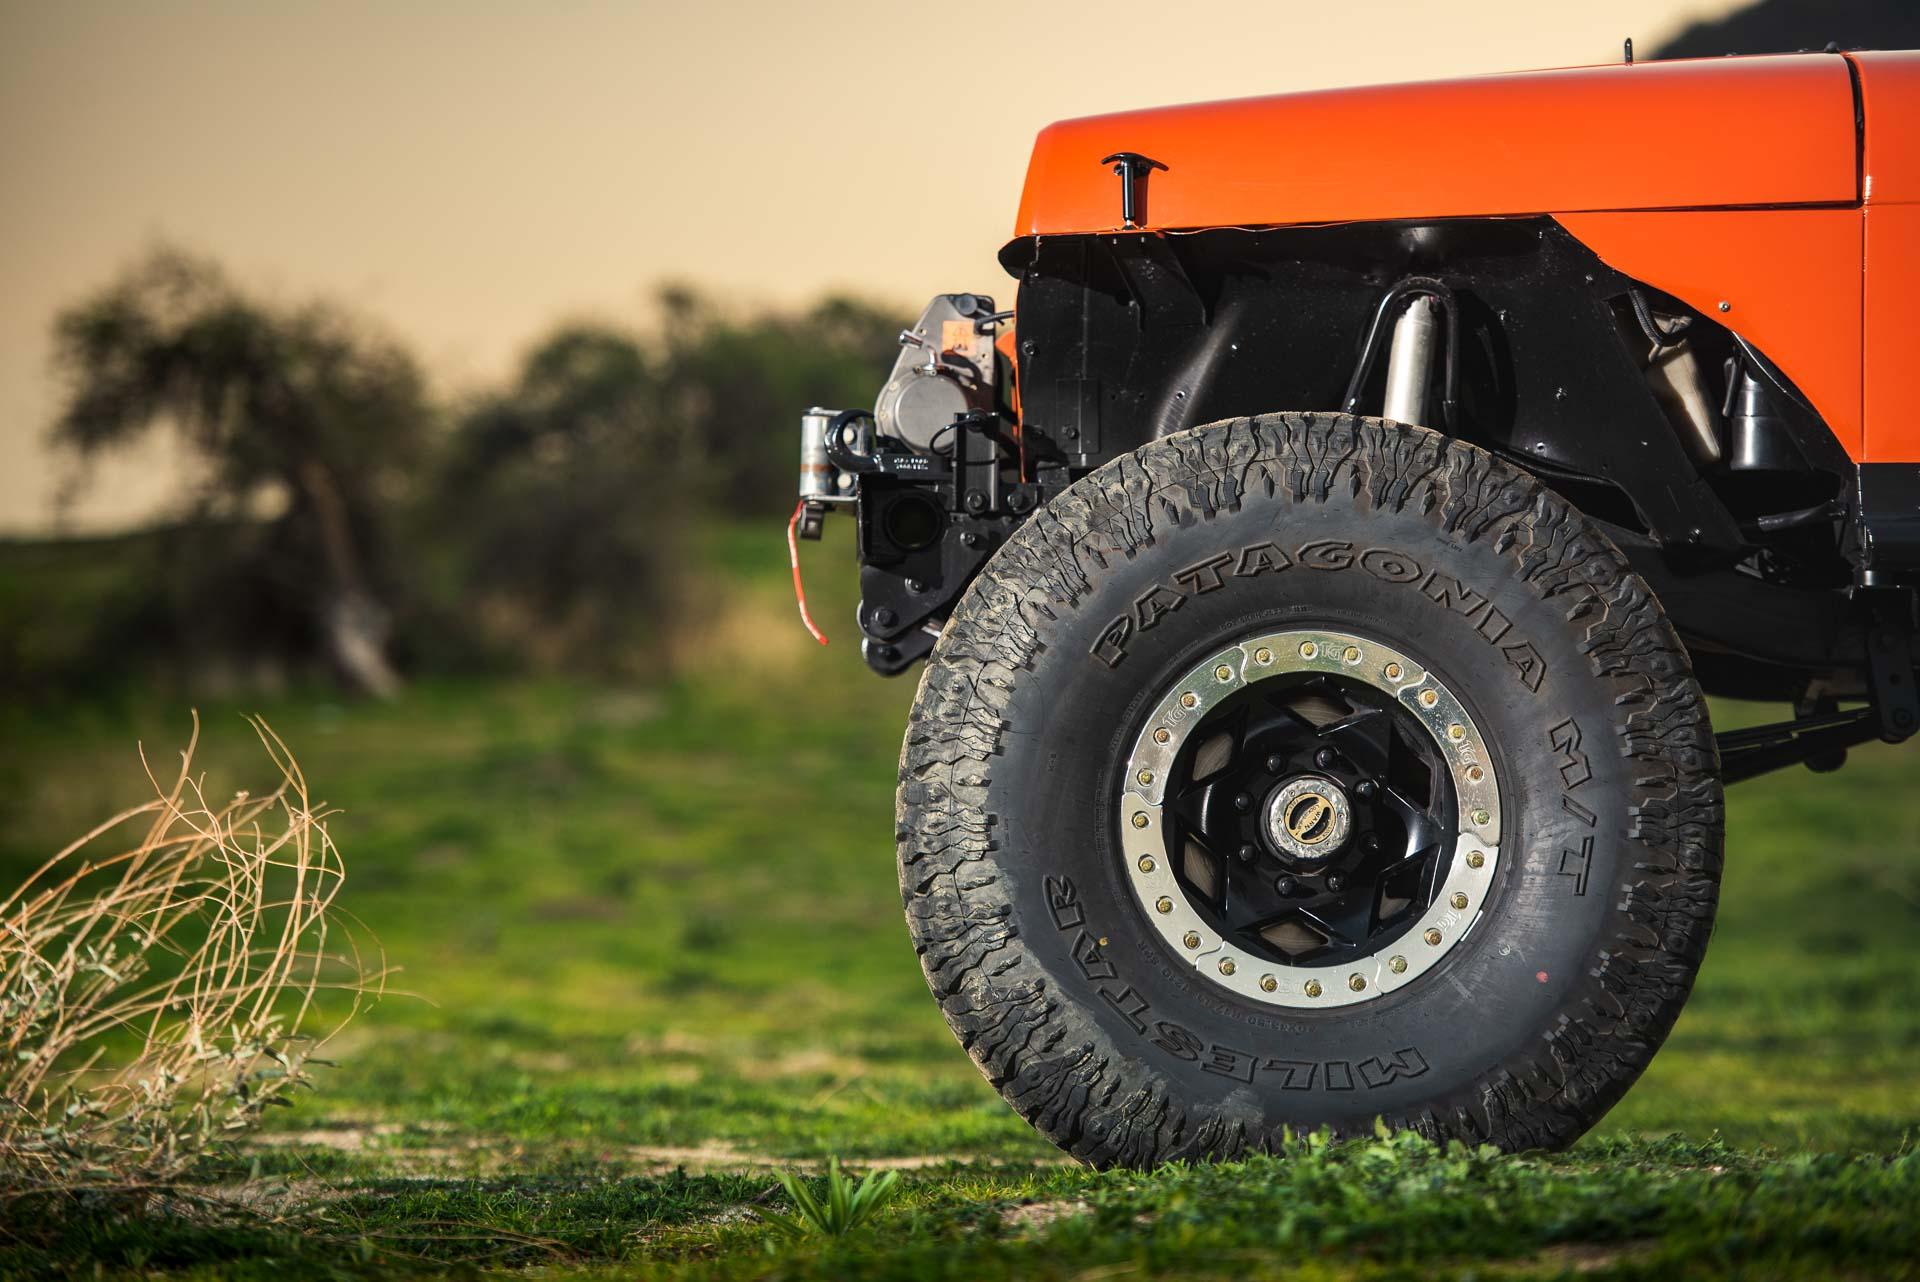 Patagonia MT tires on Jeep YJ